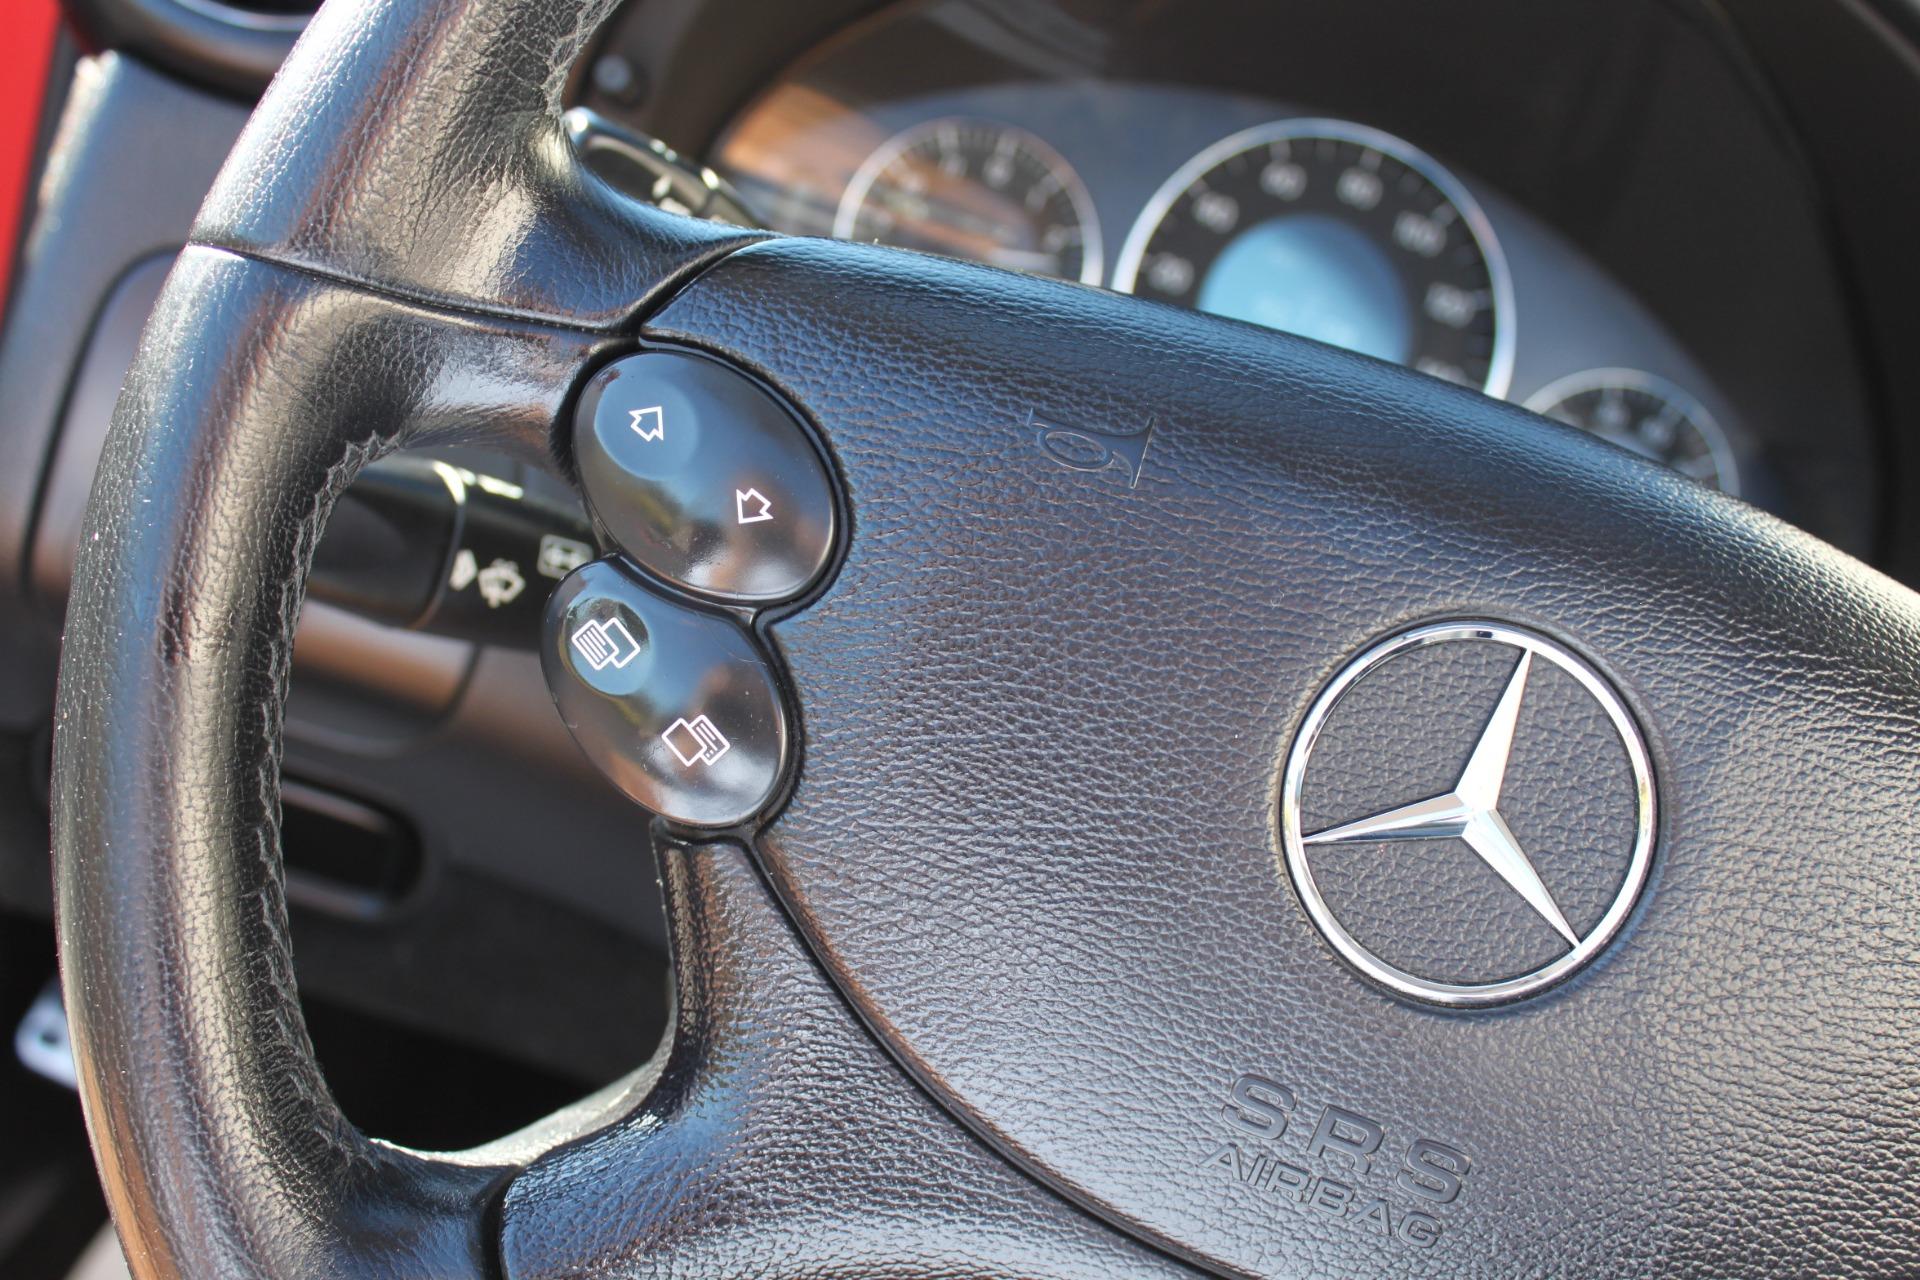 Used-2006-Mercedes-Benz-CLK-Class-CLK350-Cabriolet-35L-Land-Rover